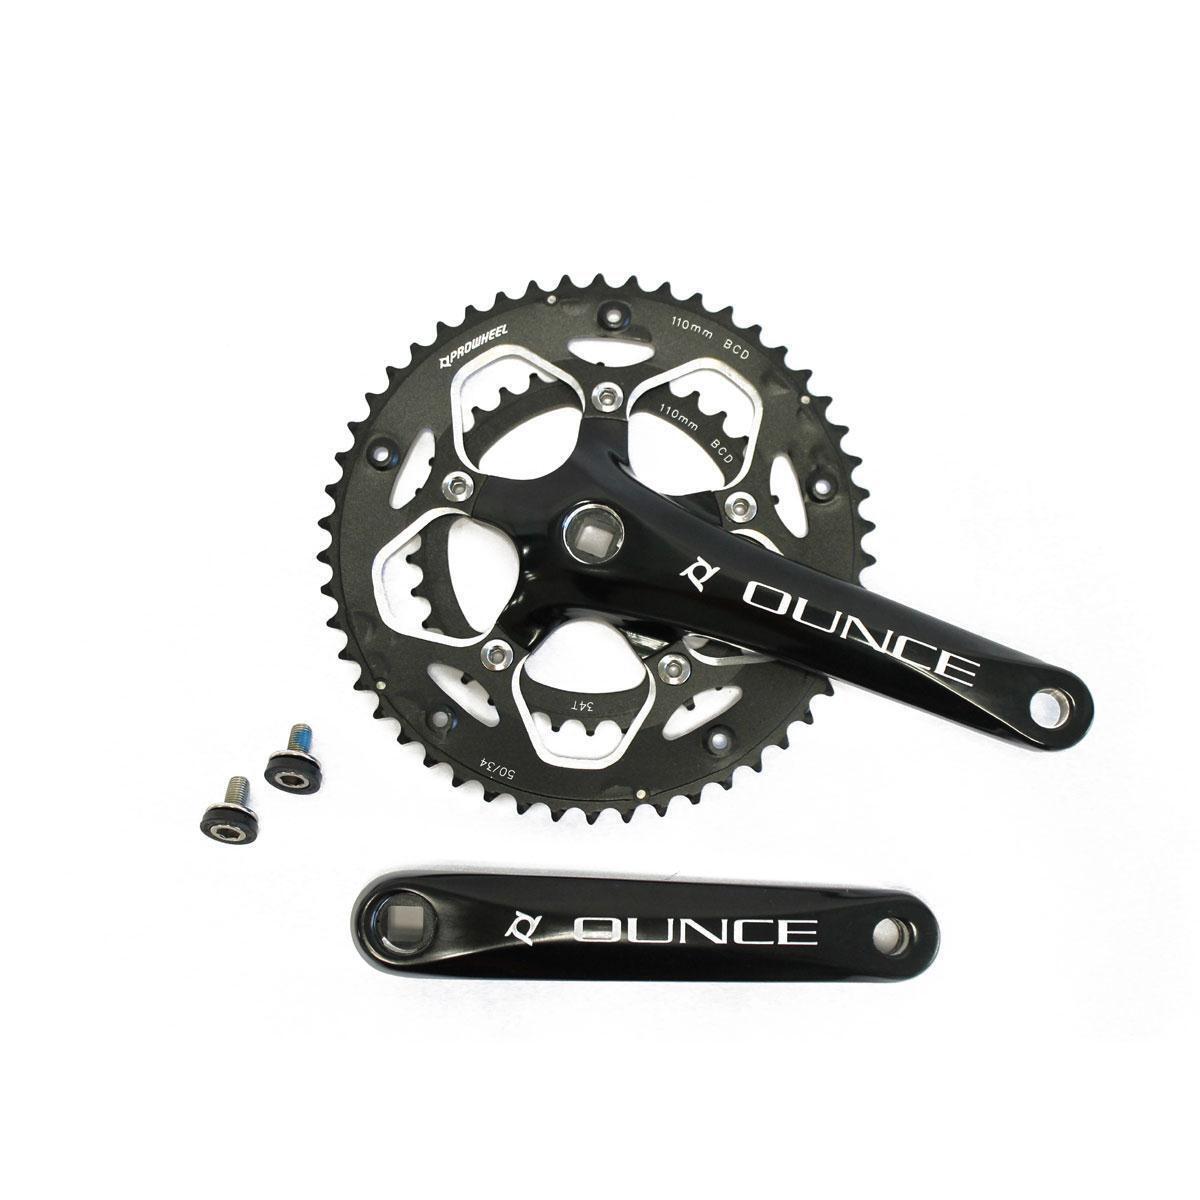 Biela 34 50 aluminio 170mm negra PROWHEEL  bici strada  hasta un 65% de descuento